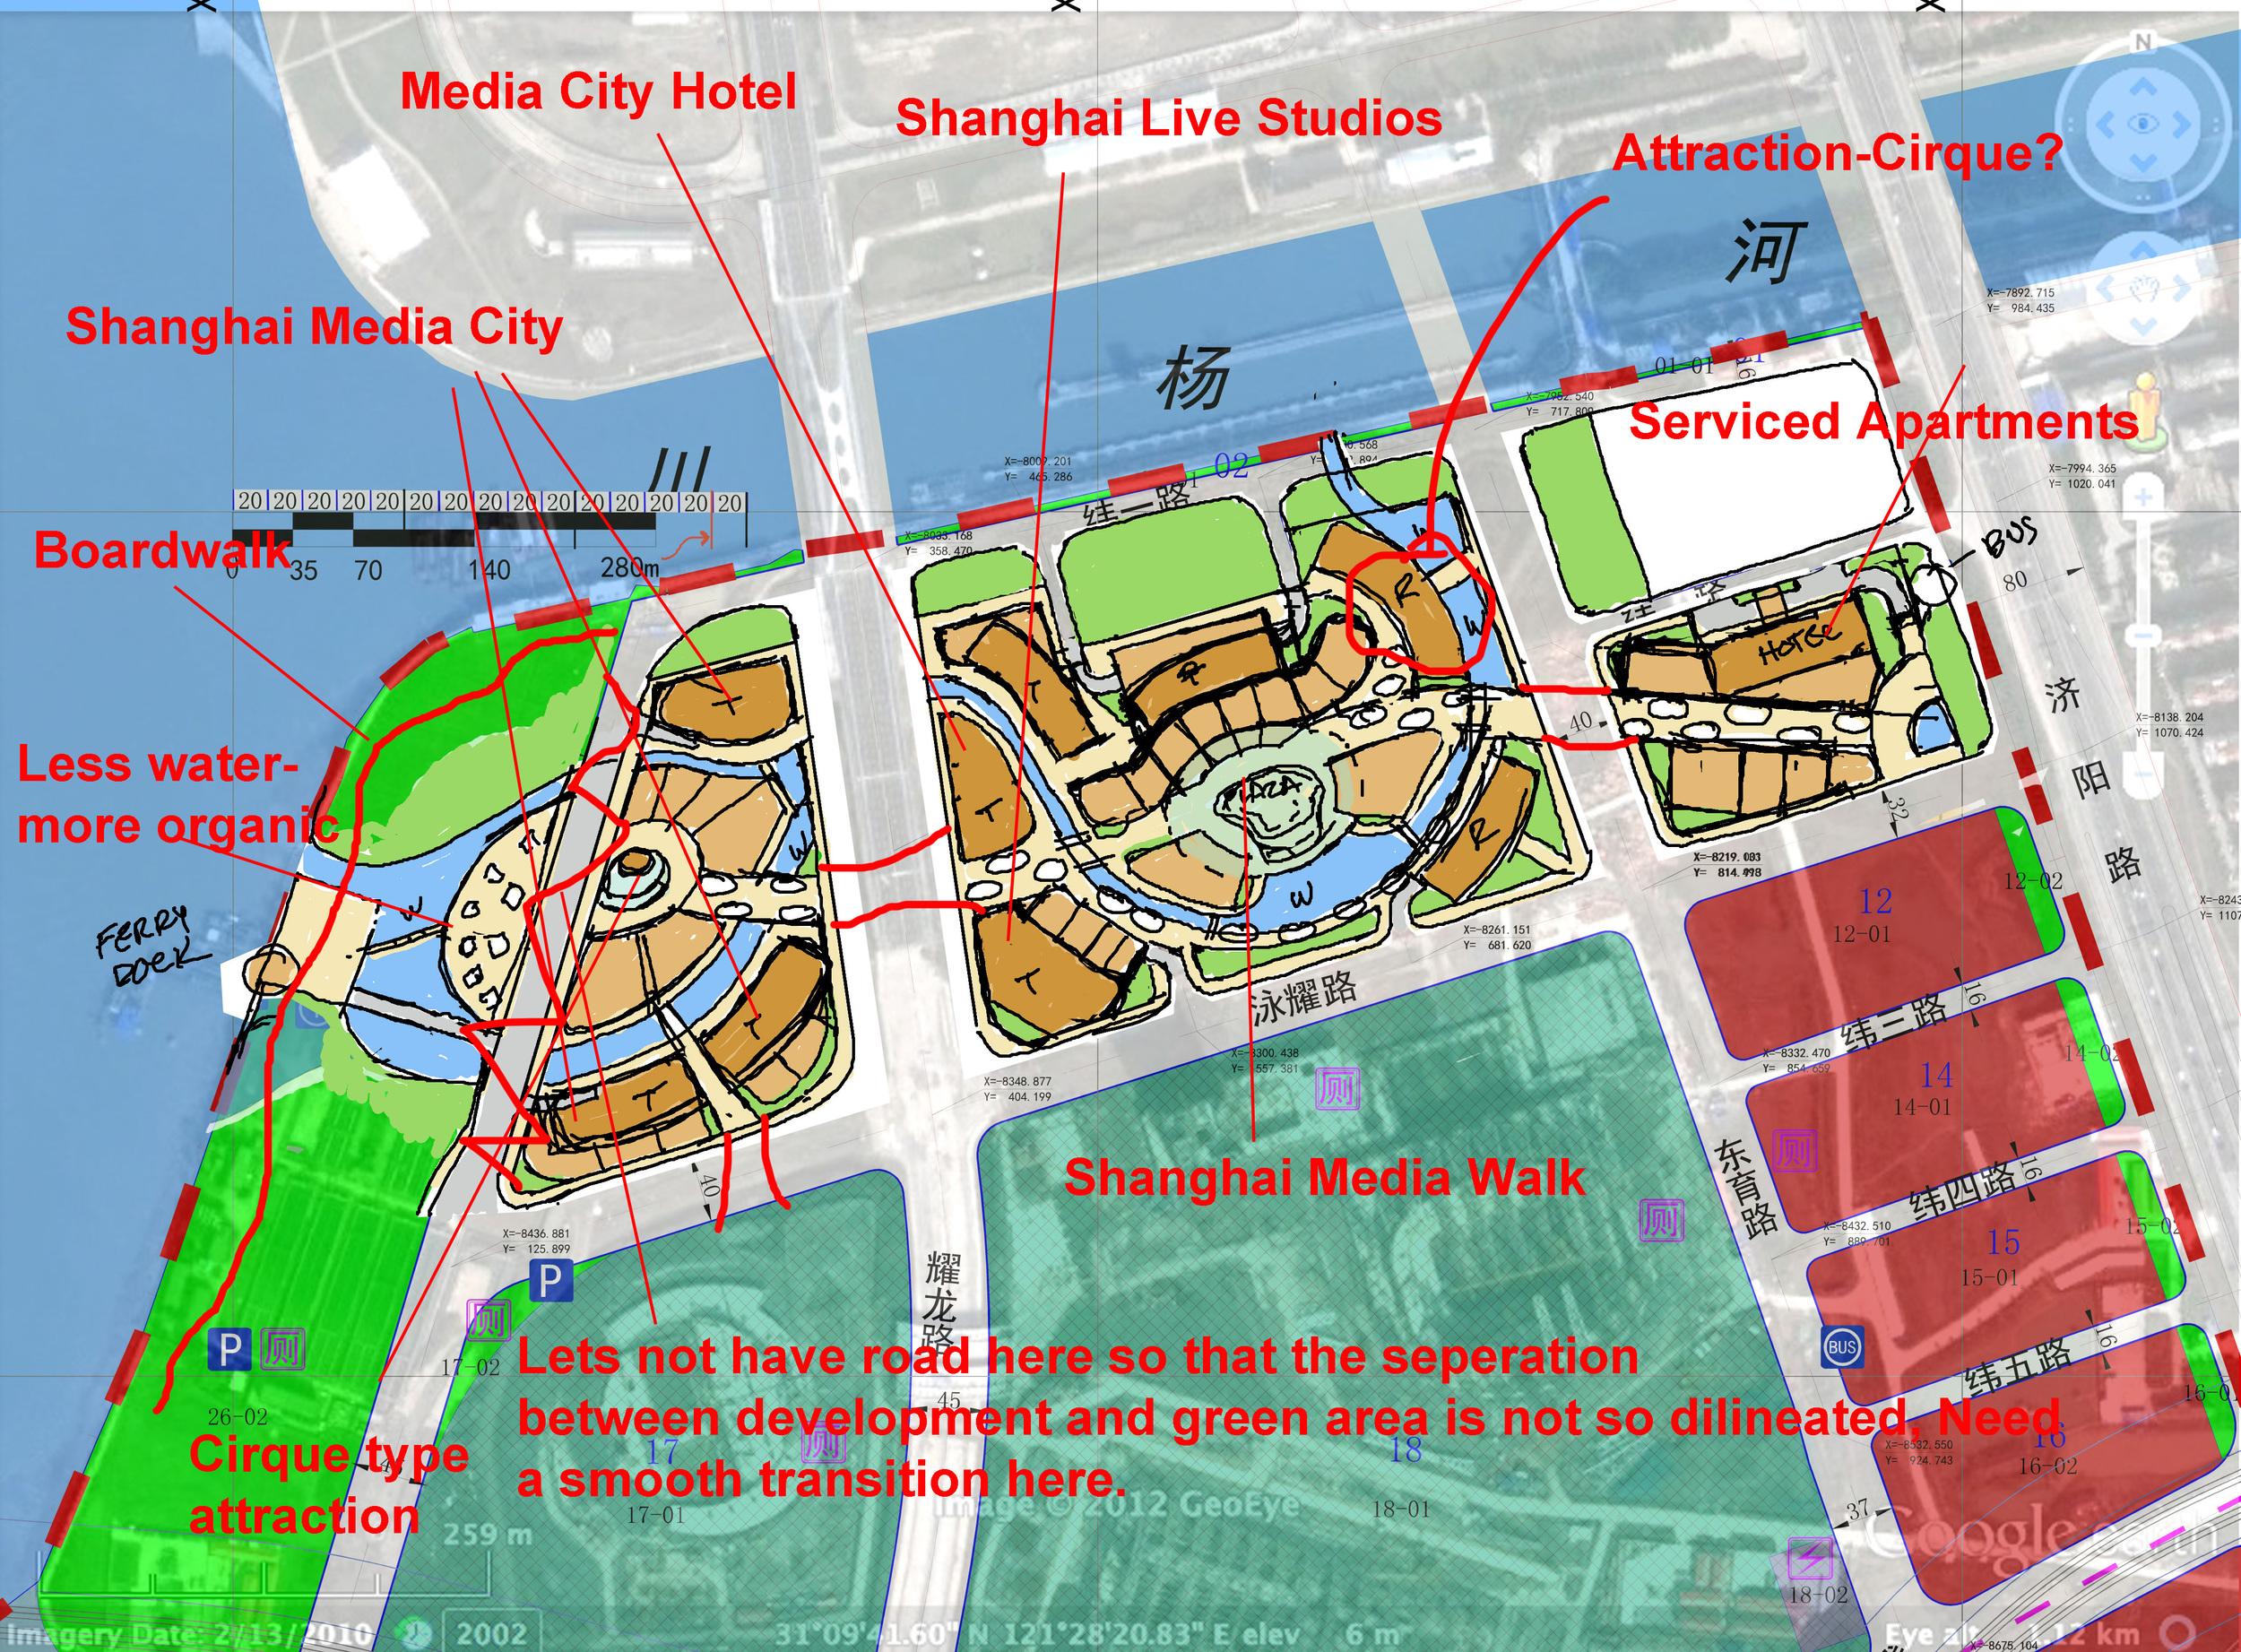 Shanghai006 marks comments (1).jpg